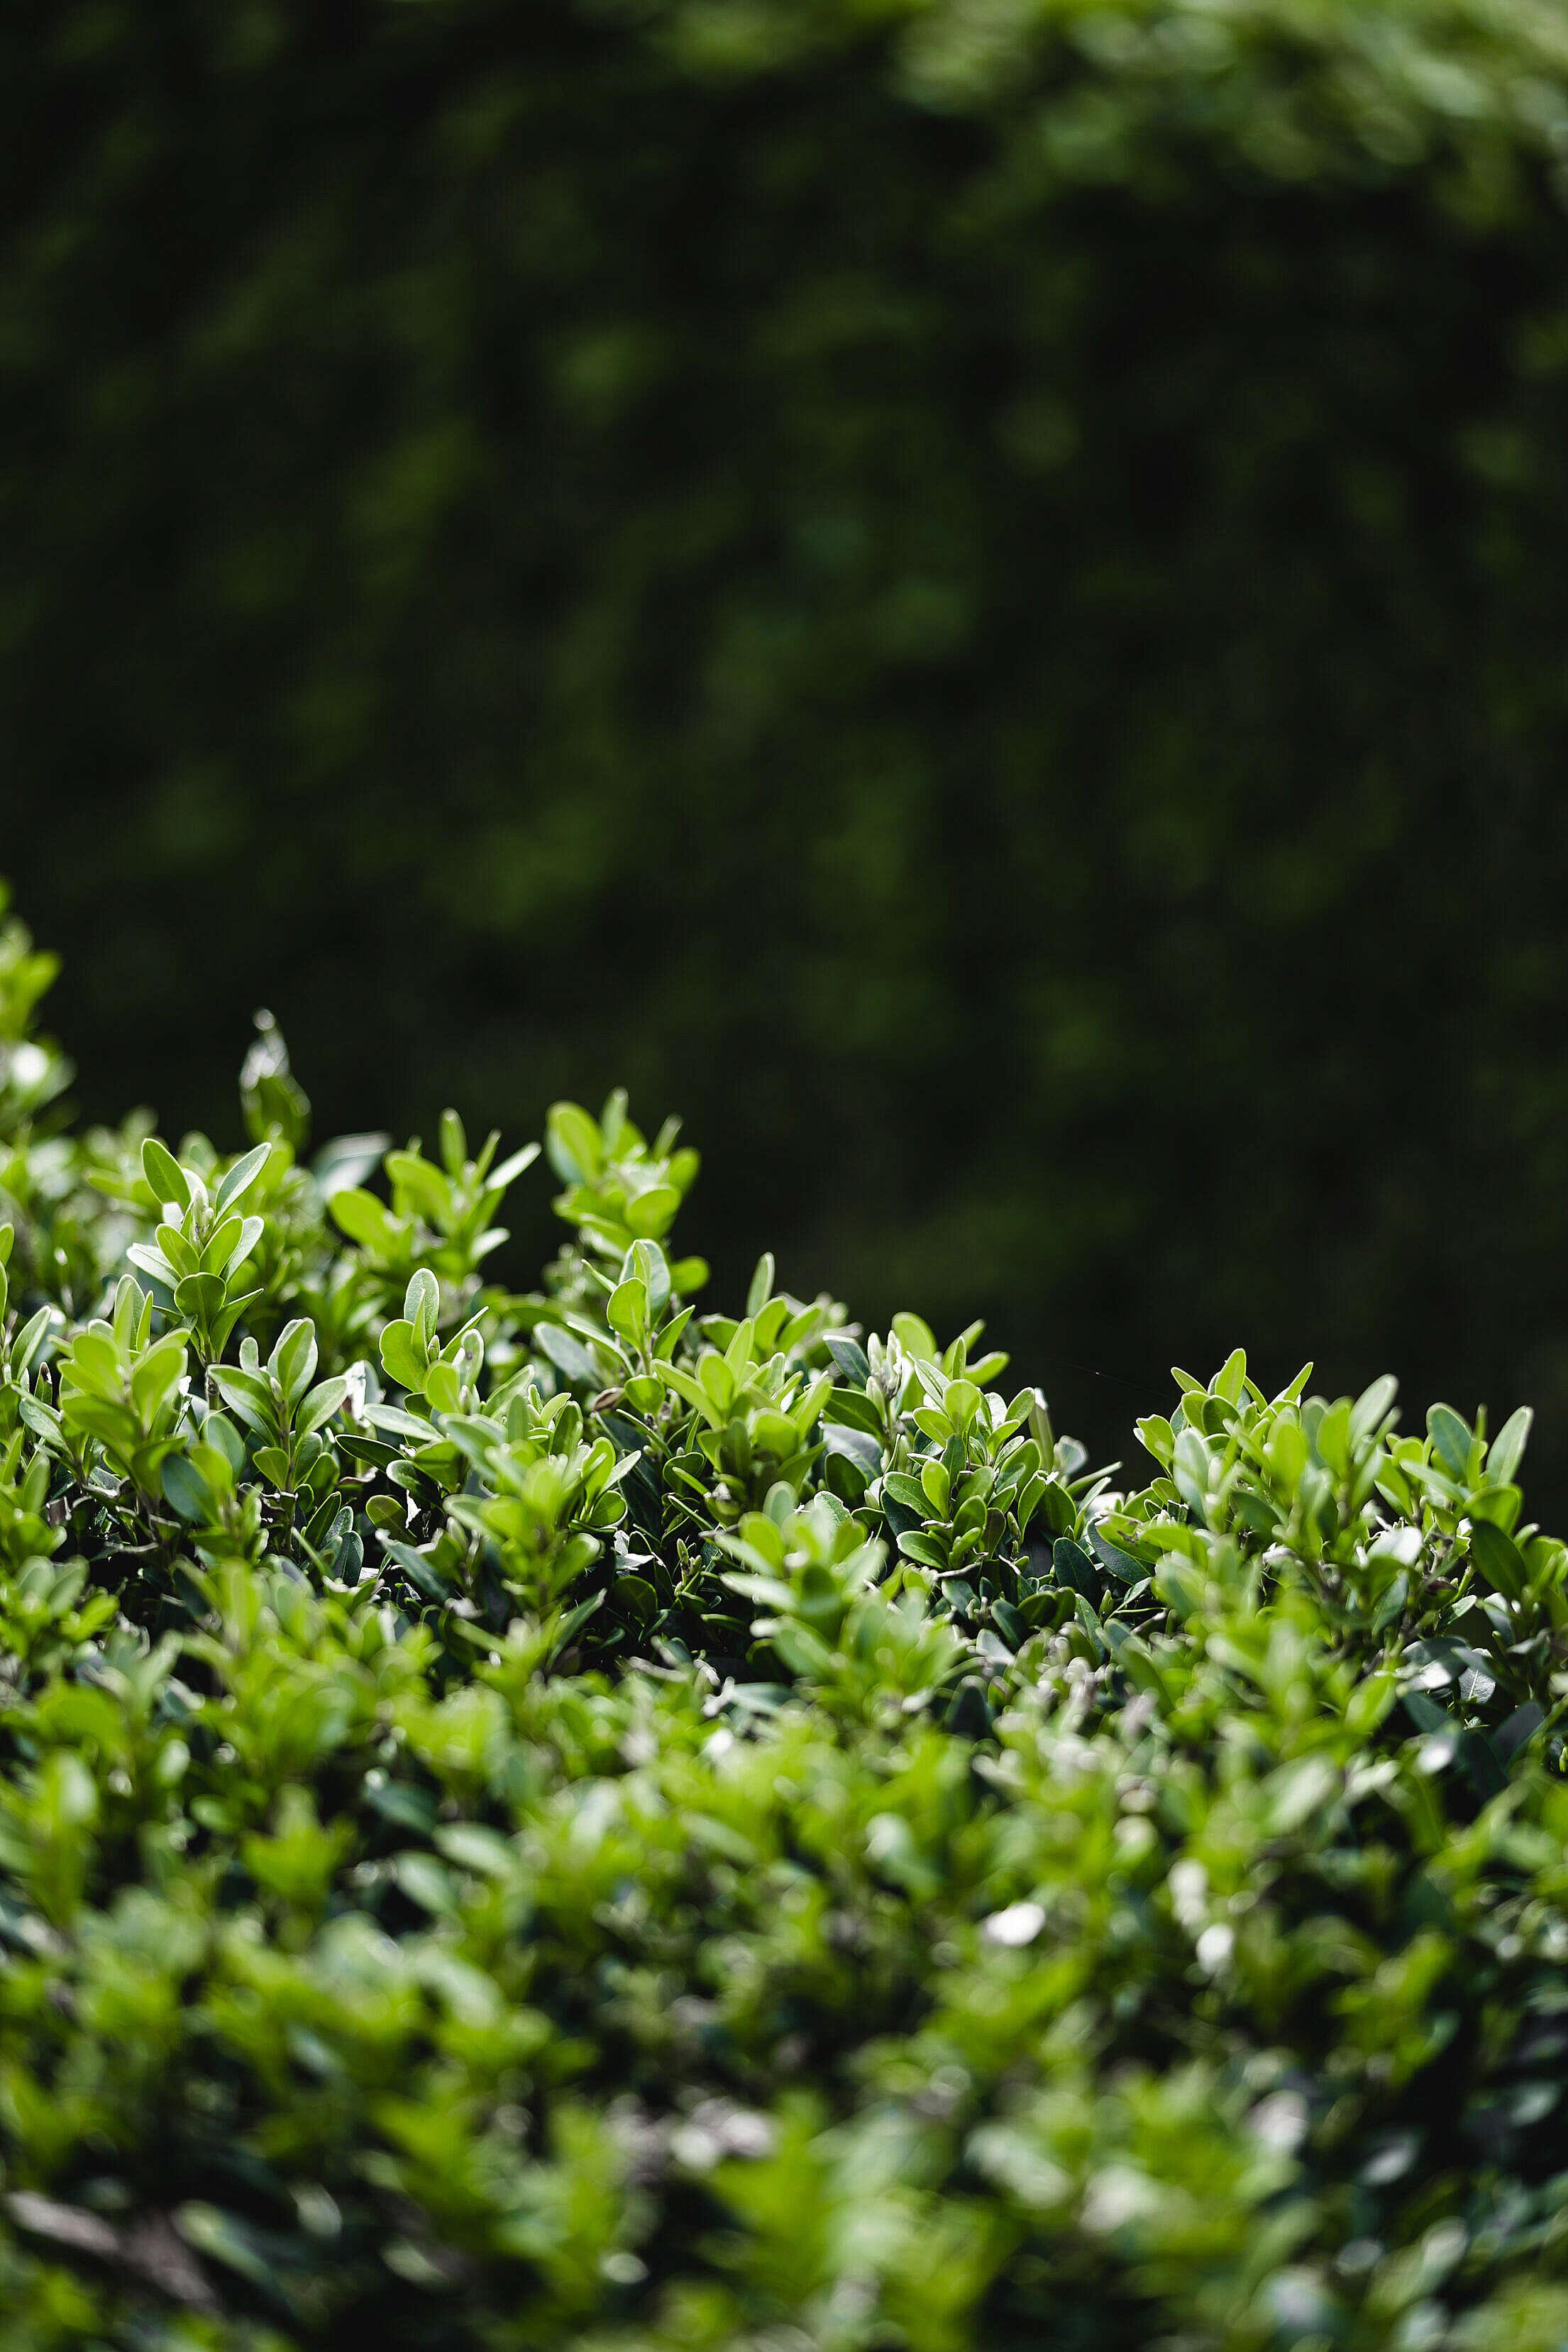 Detail of a Green Buxus Bush Free Stock Photo